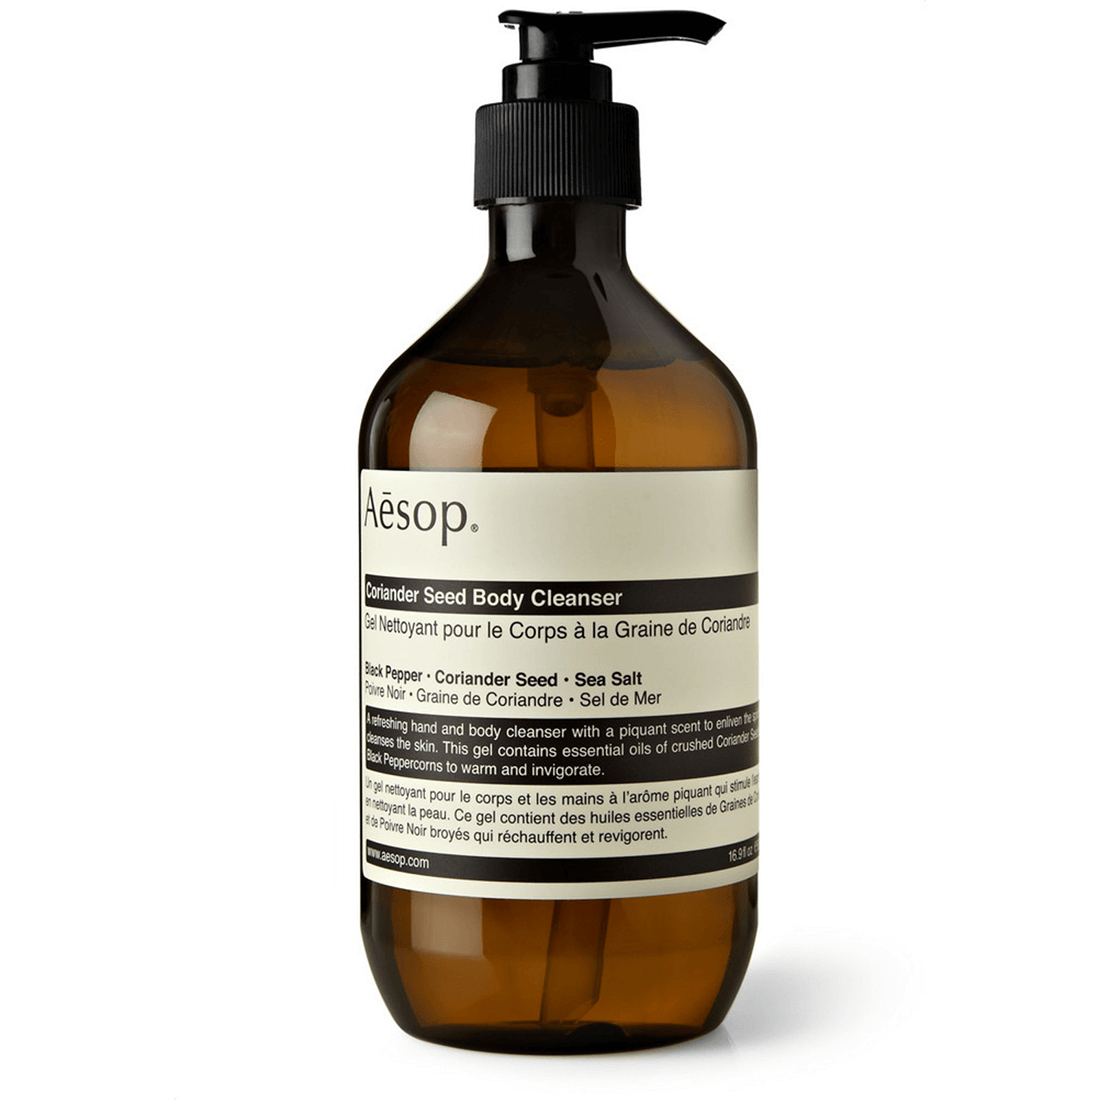 aesop-coriander-seed-body-cleanser